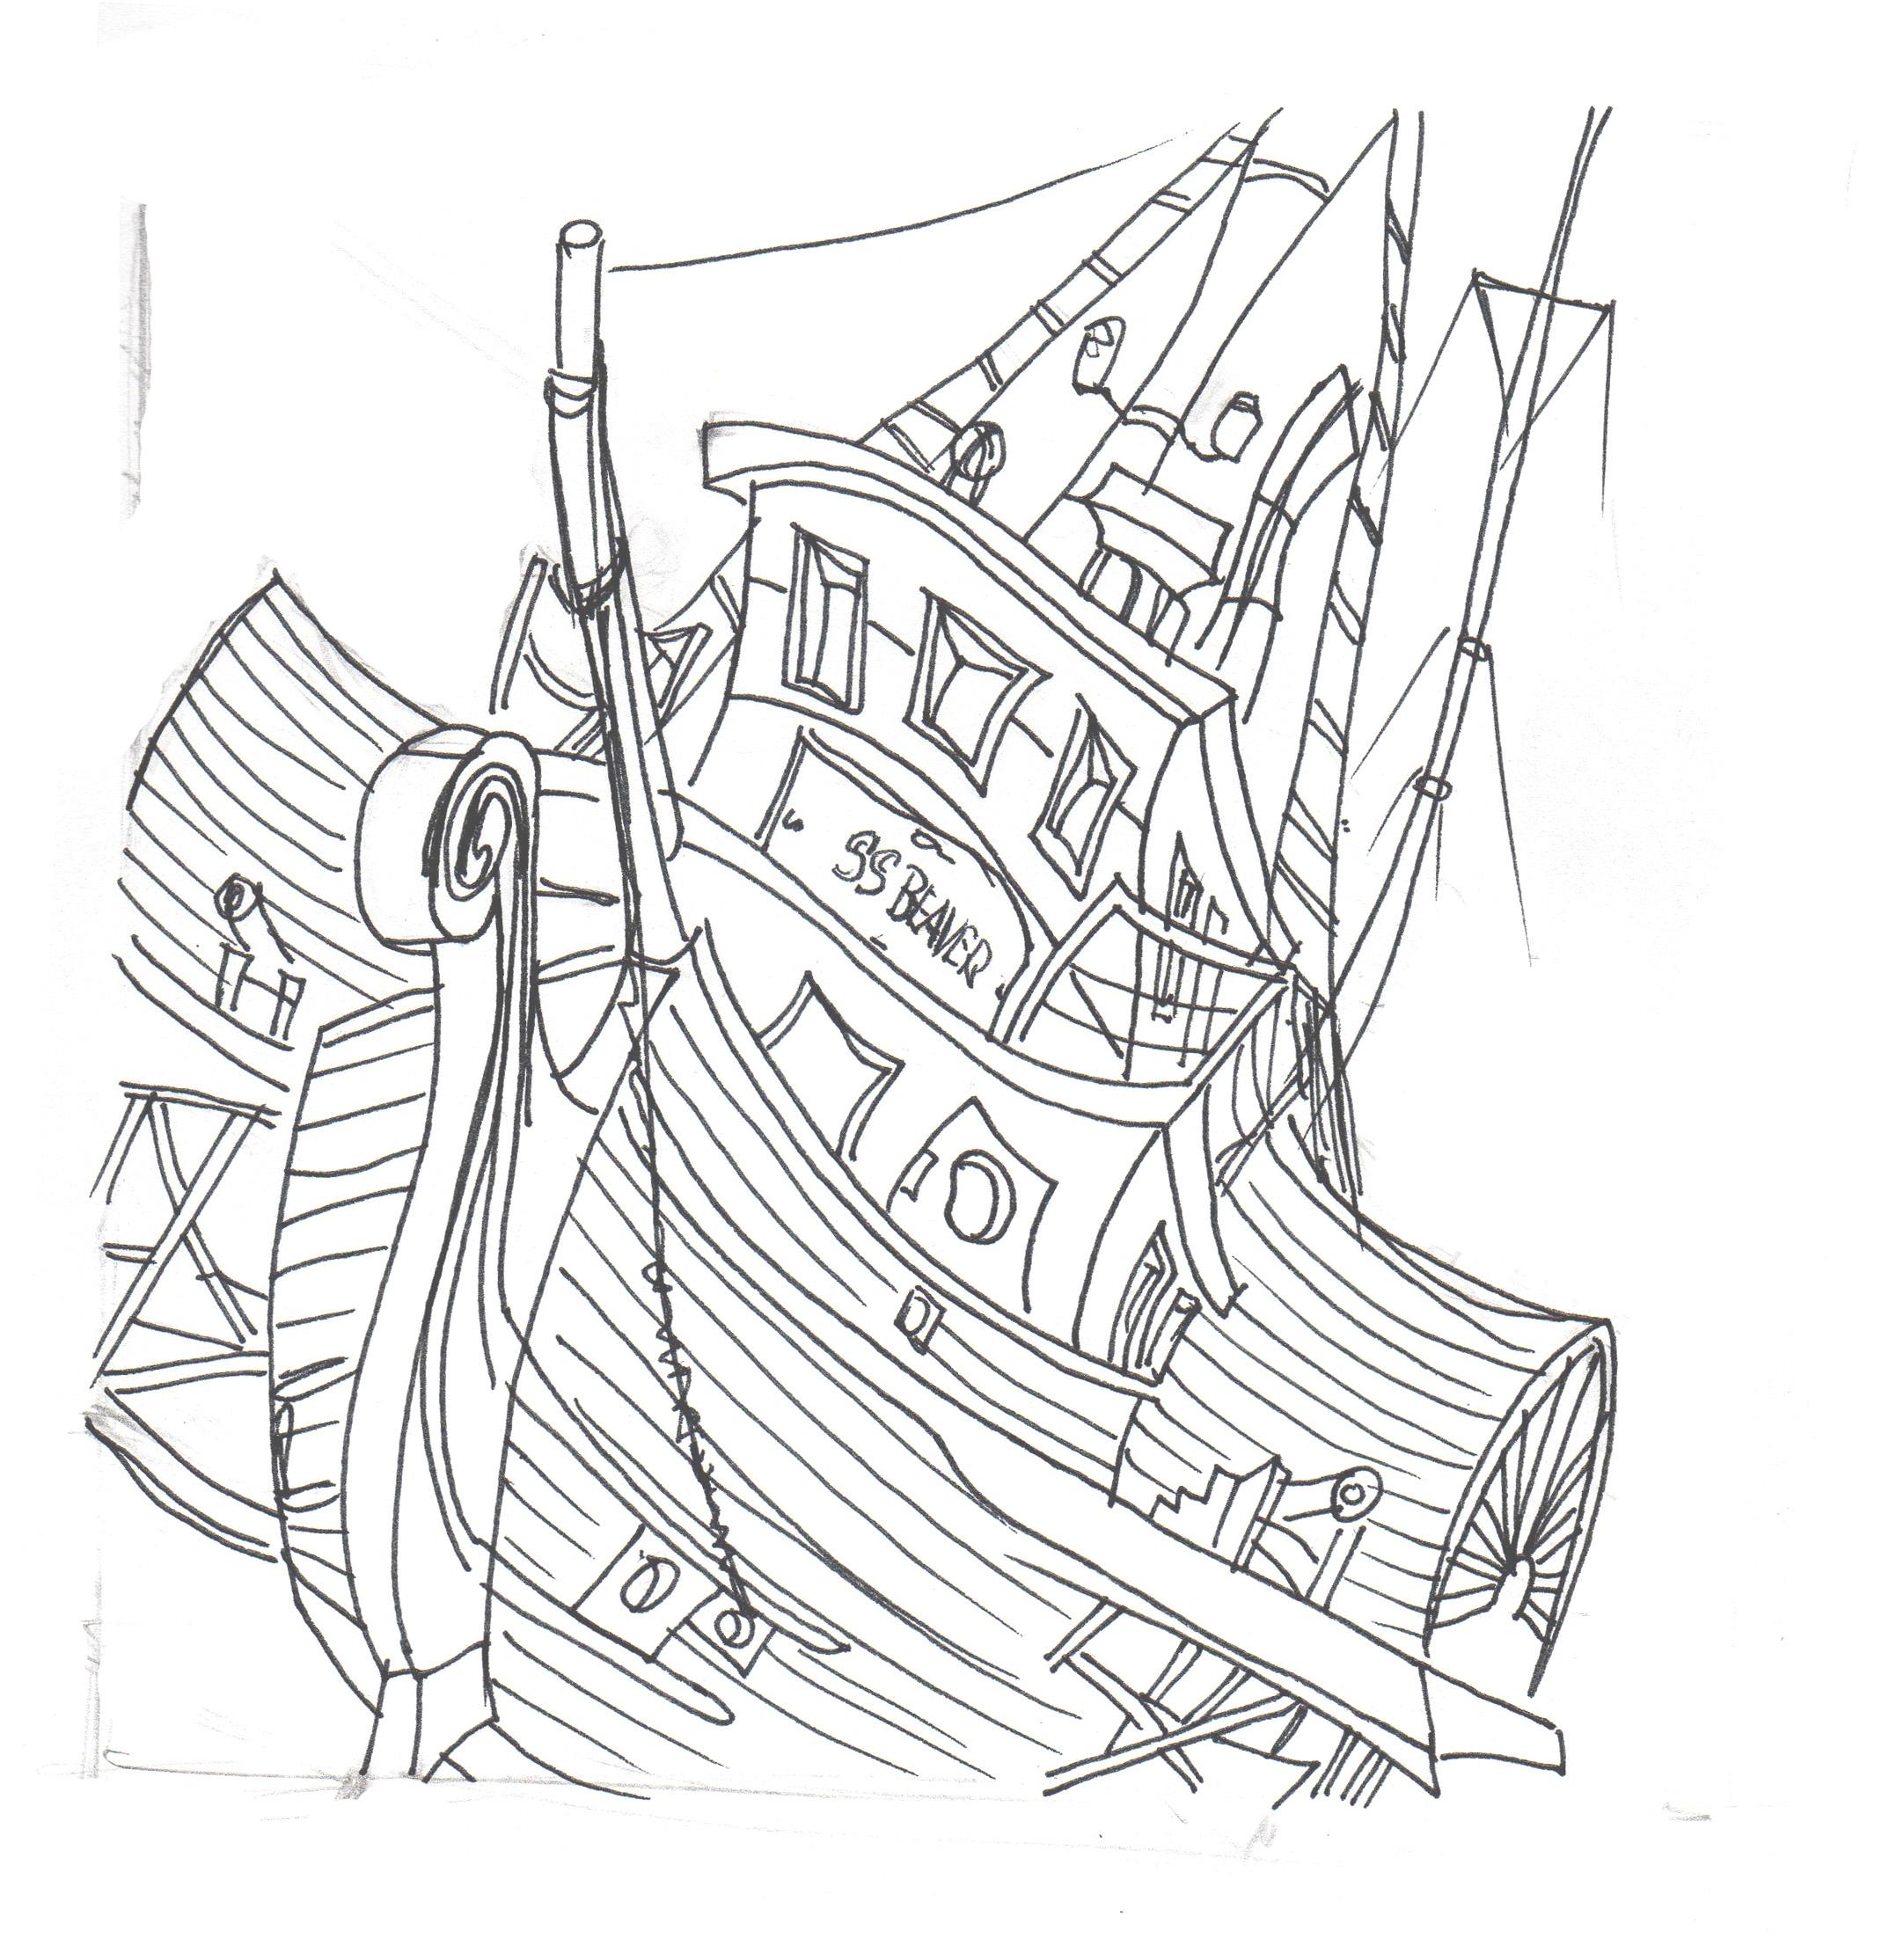 Sketch of the SS Beaver, copyright 2009 Martin Machacek